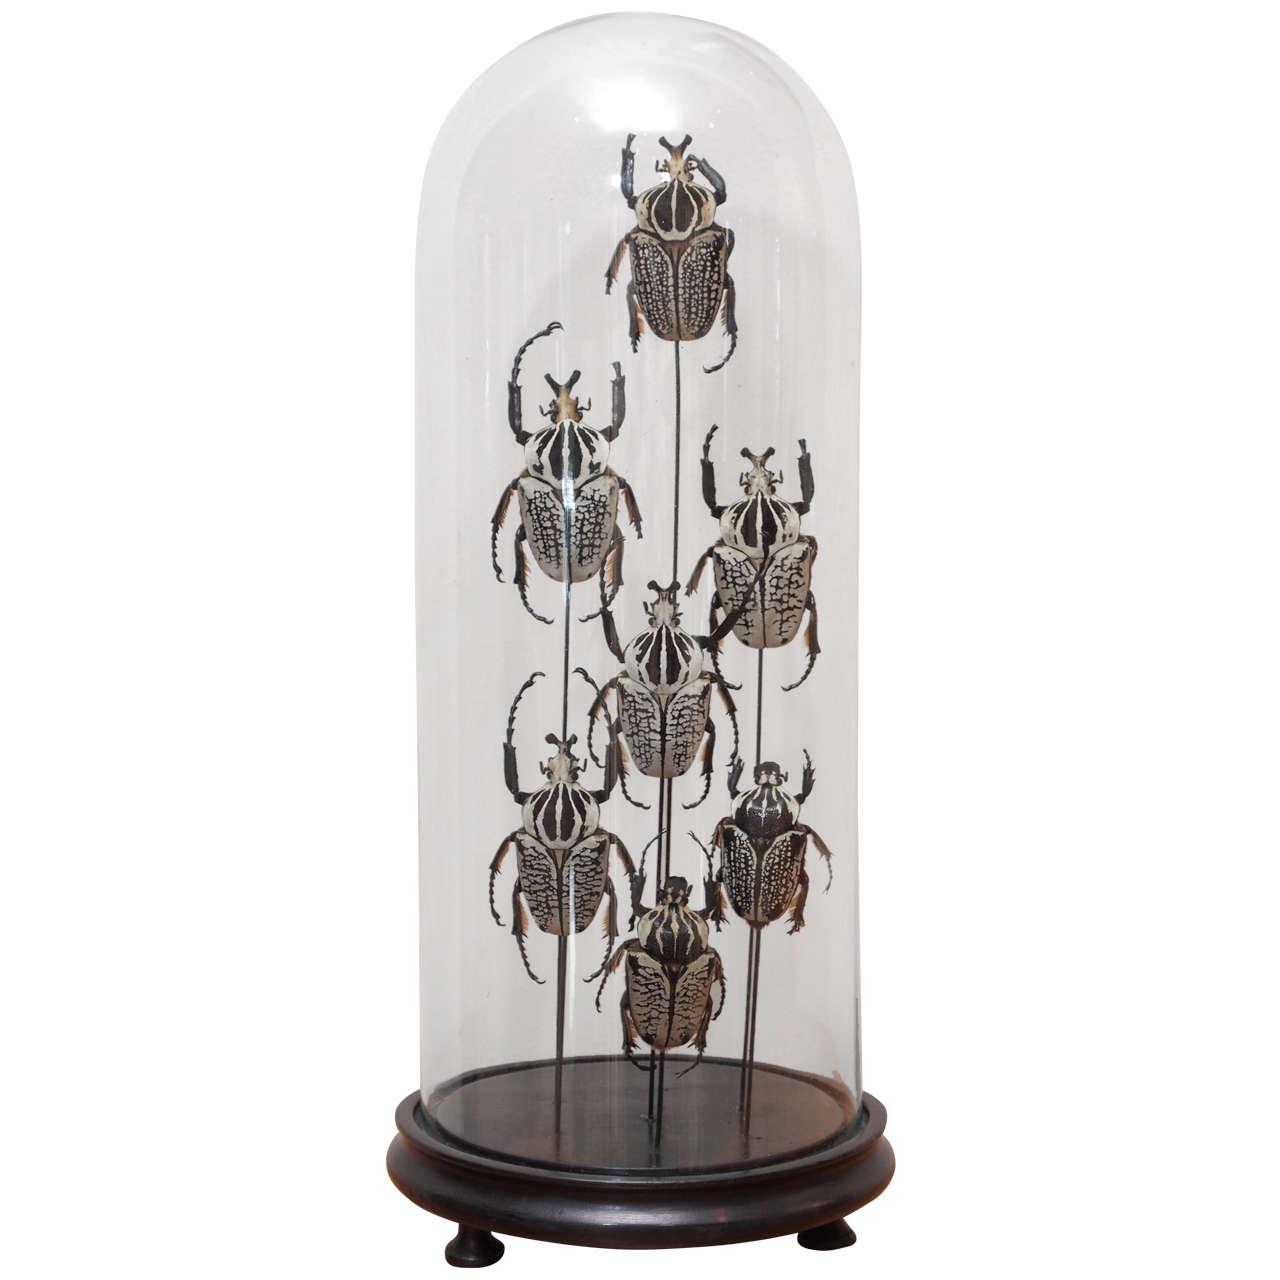 Specimen Beetles Under Glass Dome 1